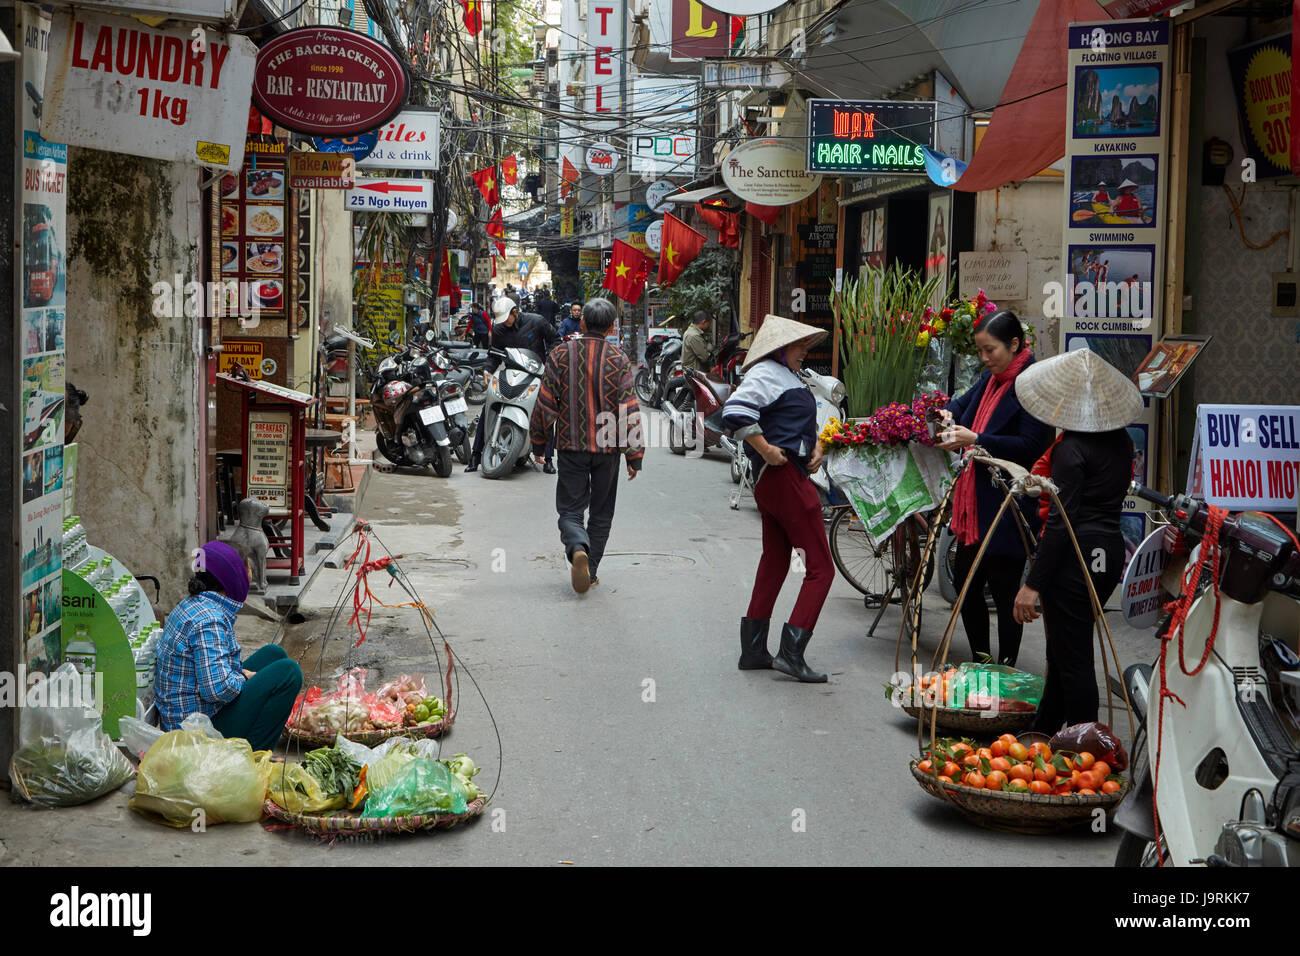 Street vendors and narrow alley, Old Quarter, Hanoi, Vietnam - Stock Image